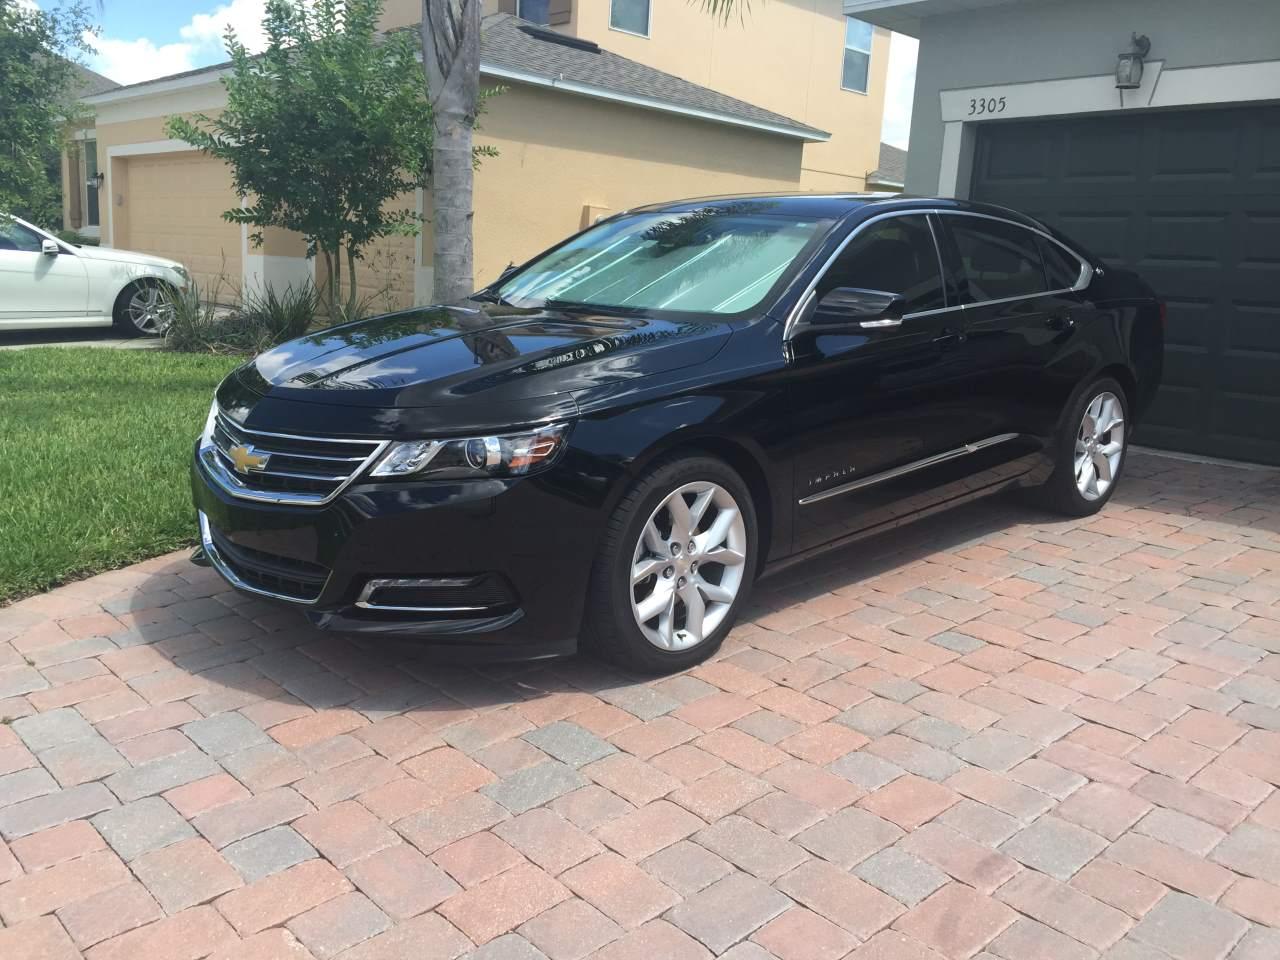 Show me your MODs - Chevy Impala Forums